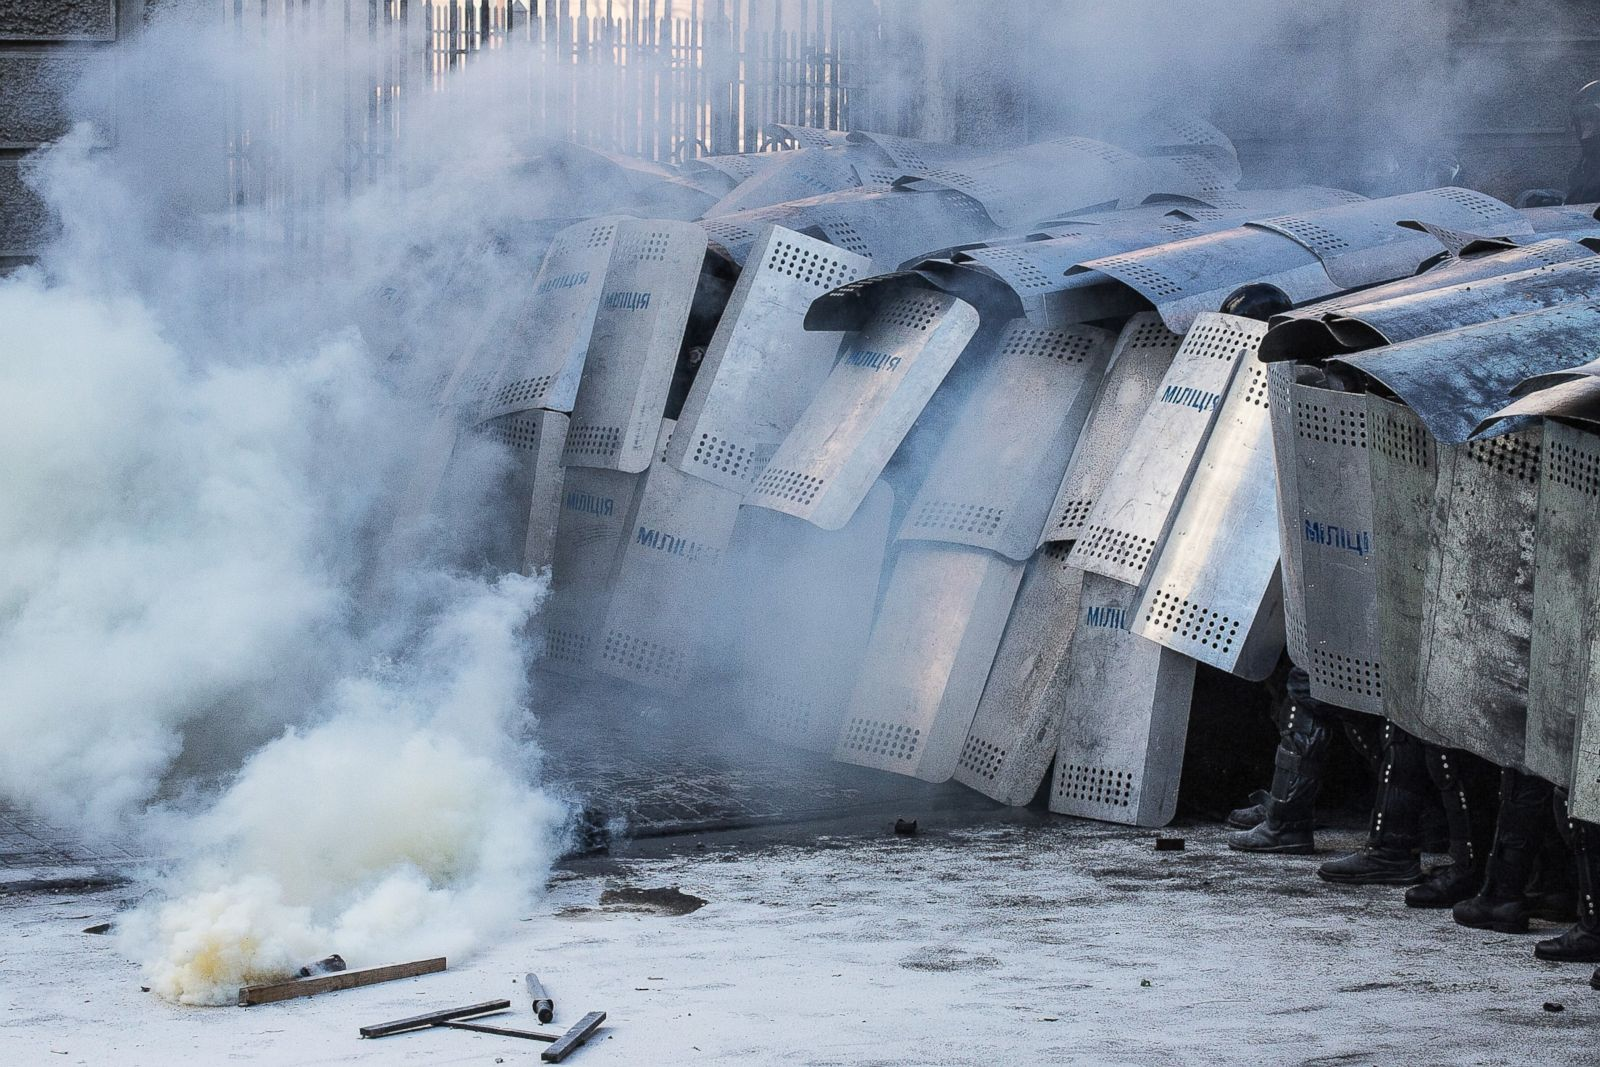 Kiova helmikuu 2014, kuva lähteestä abcnews.go.com